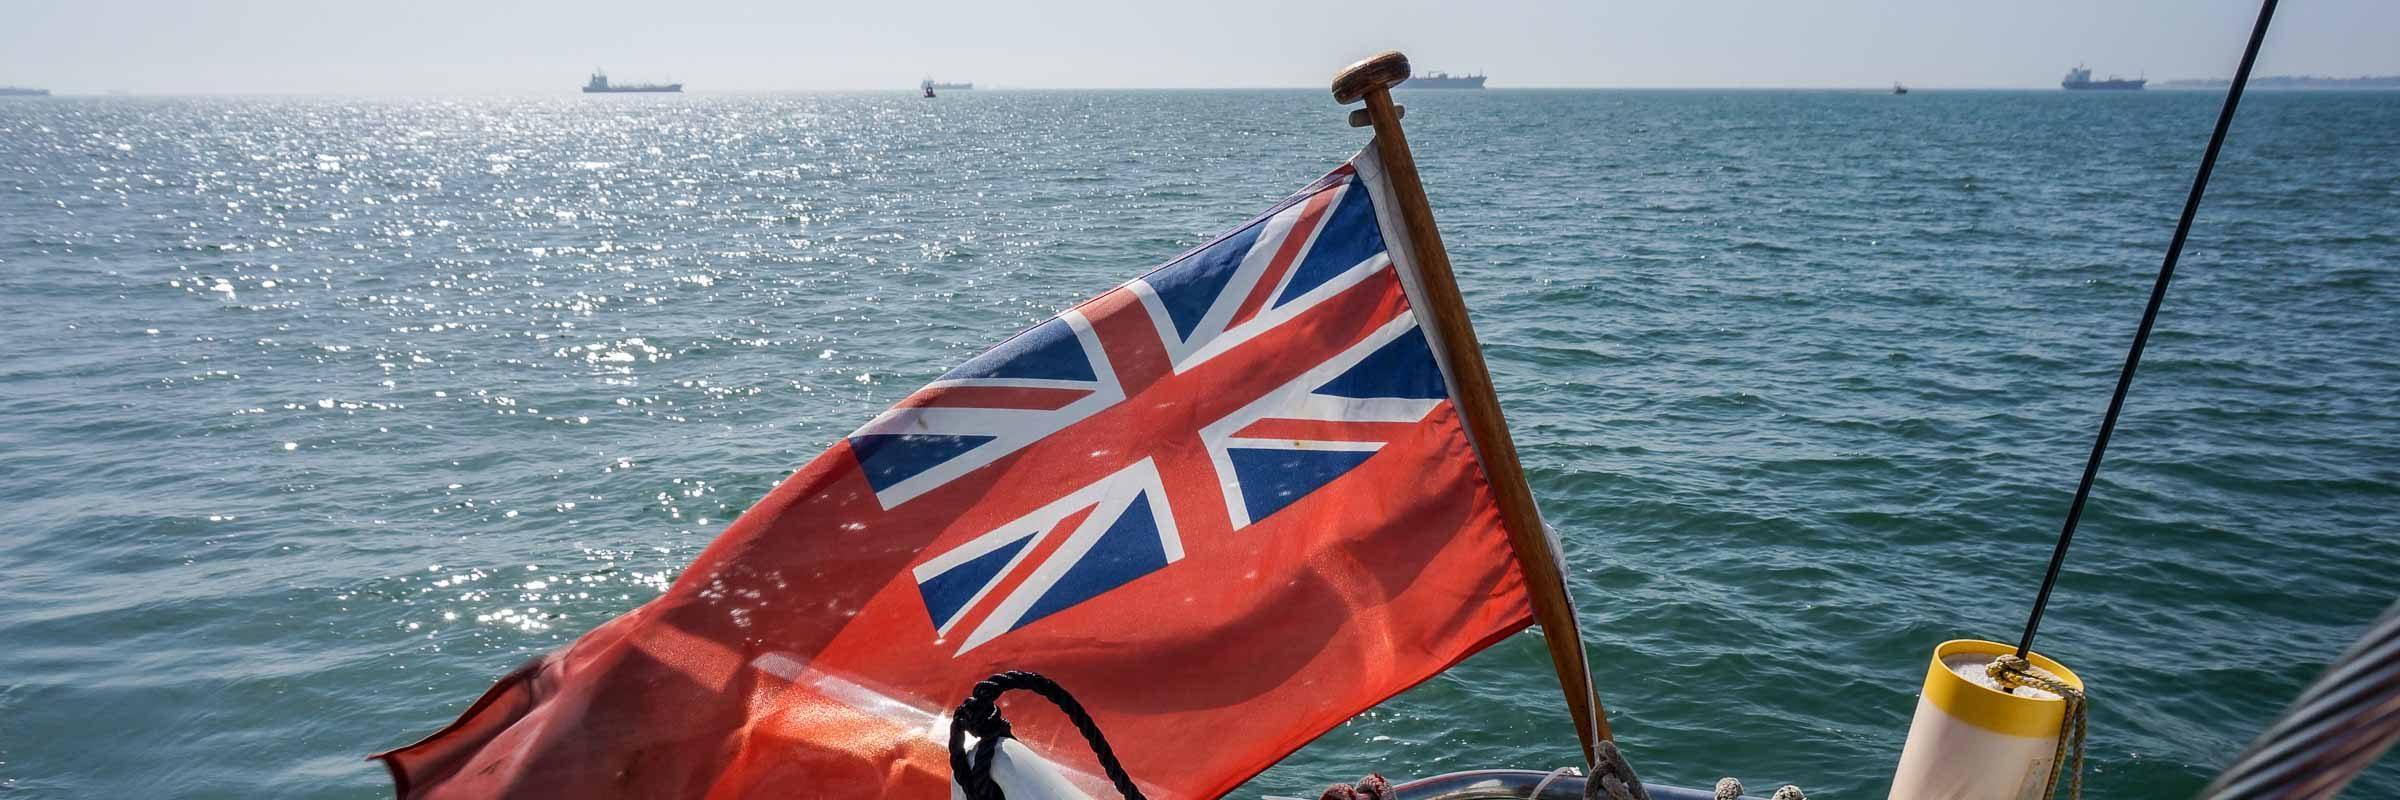 The British ensign